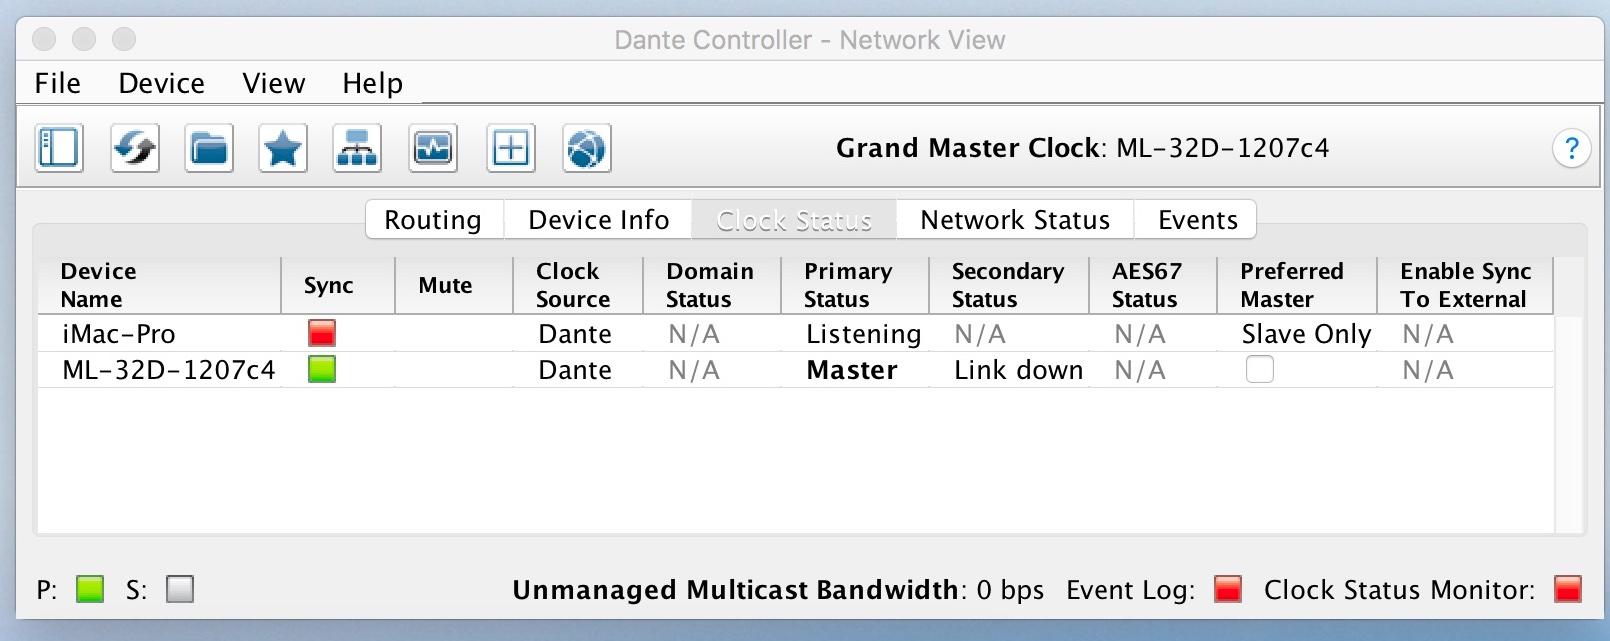 Dante Virtual Soundcard Woes On An iMac Pro – Bzangy Groink